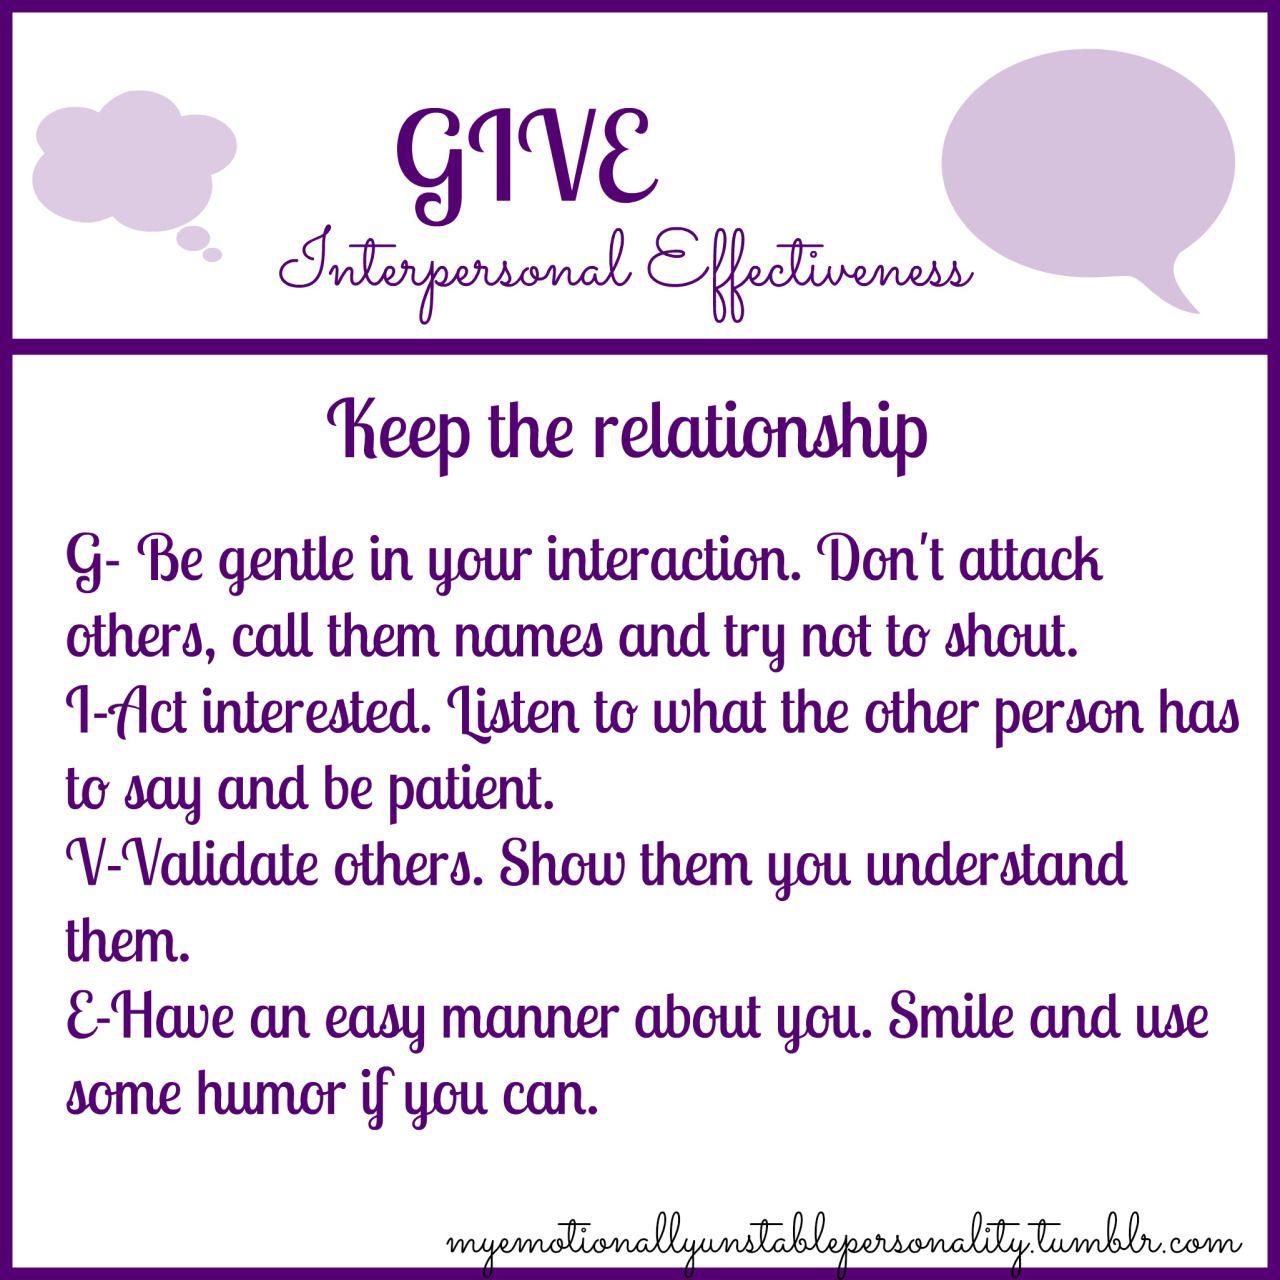 Interpersonal Effectiveness Acronym